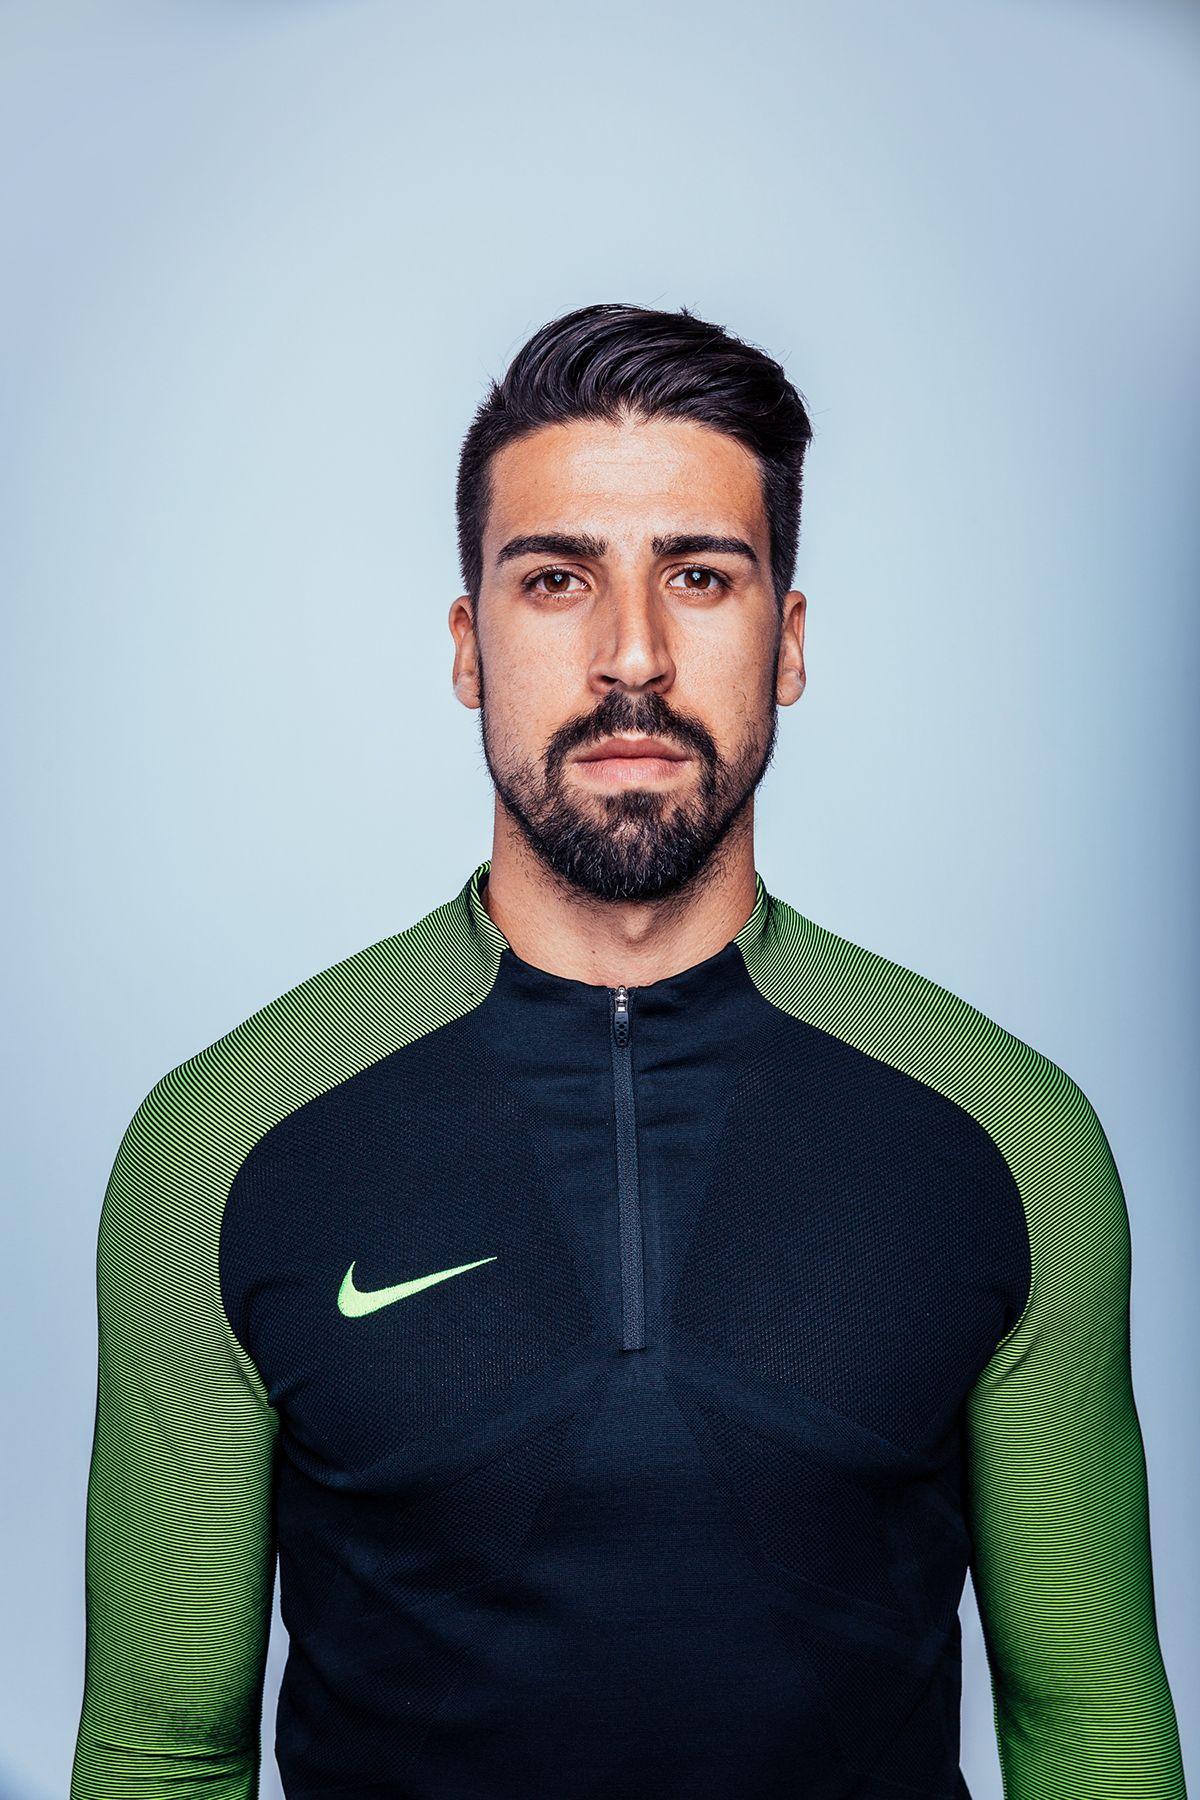 Https Www Behance Net Gallery 37999645 Chilling With Sami Khedira Nike Fussball Schalke 04